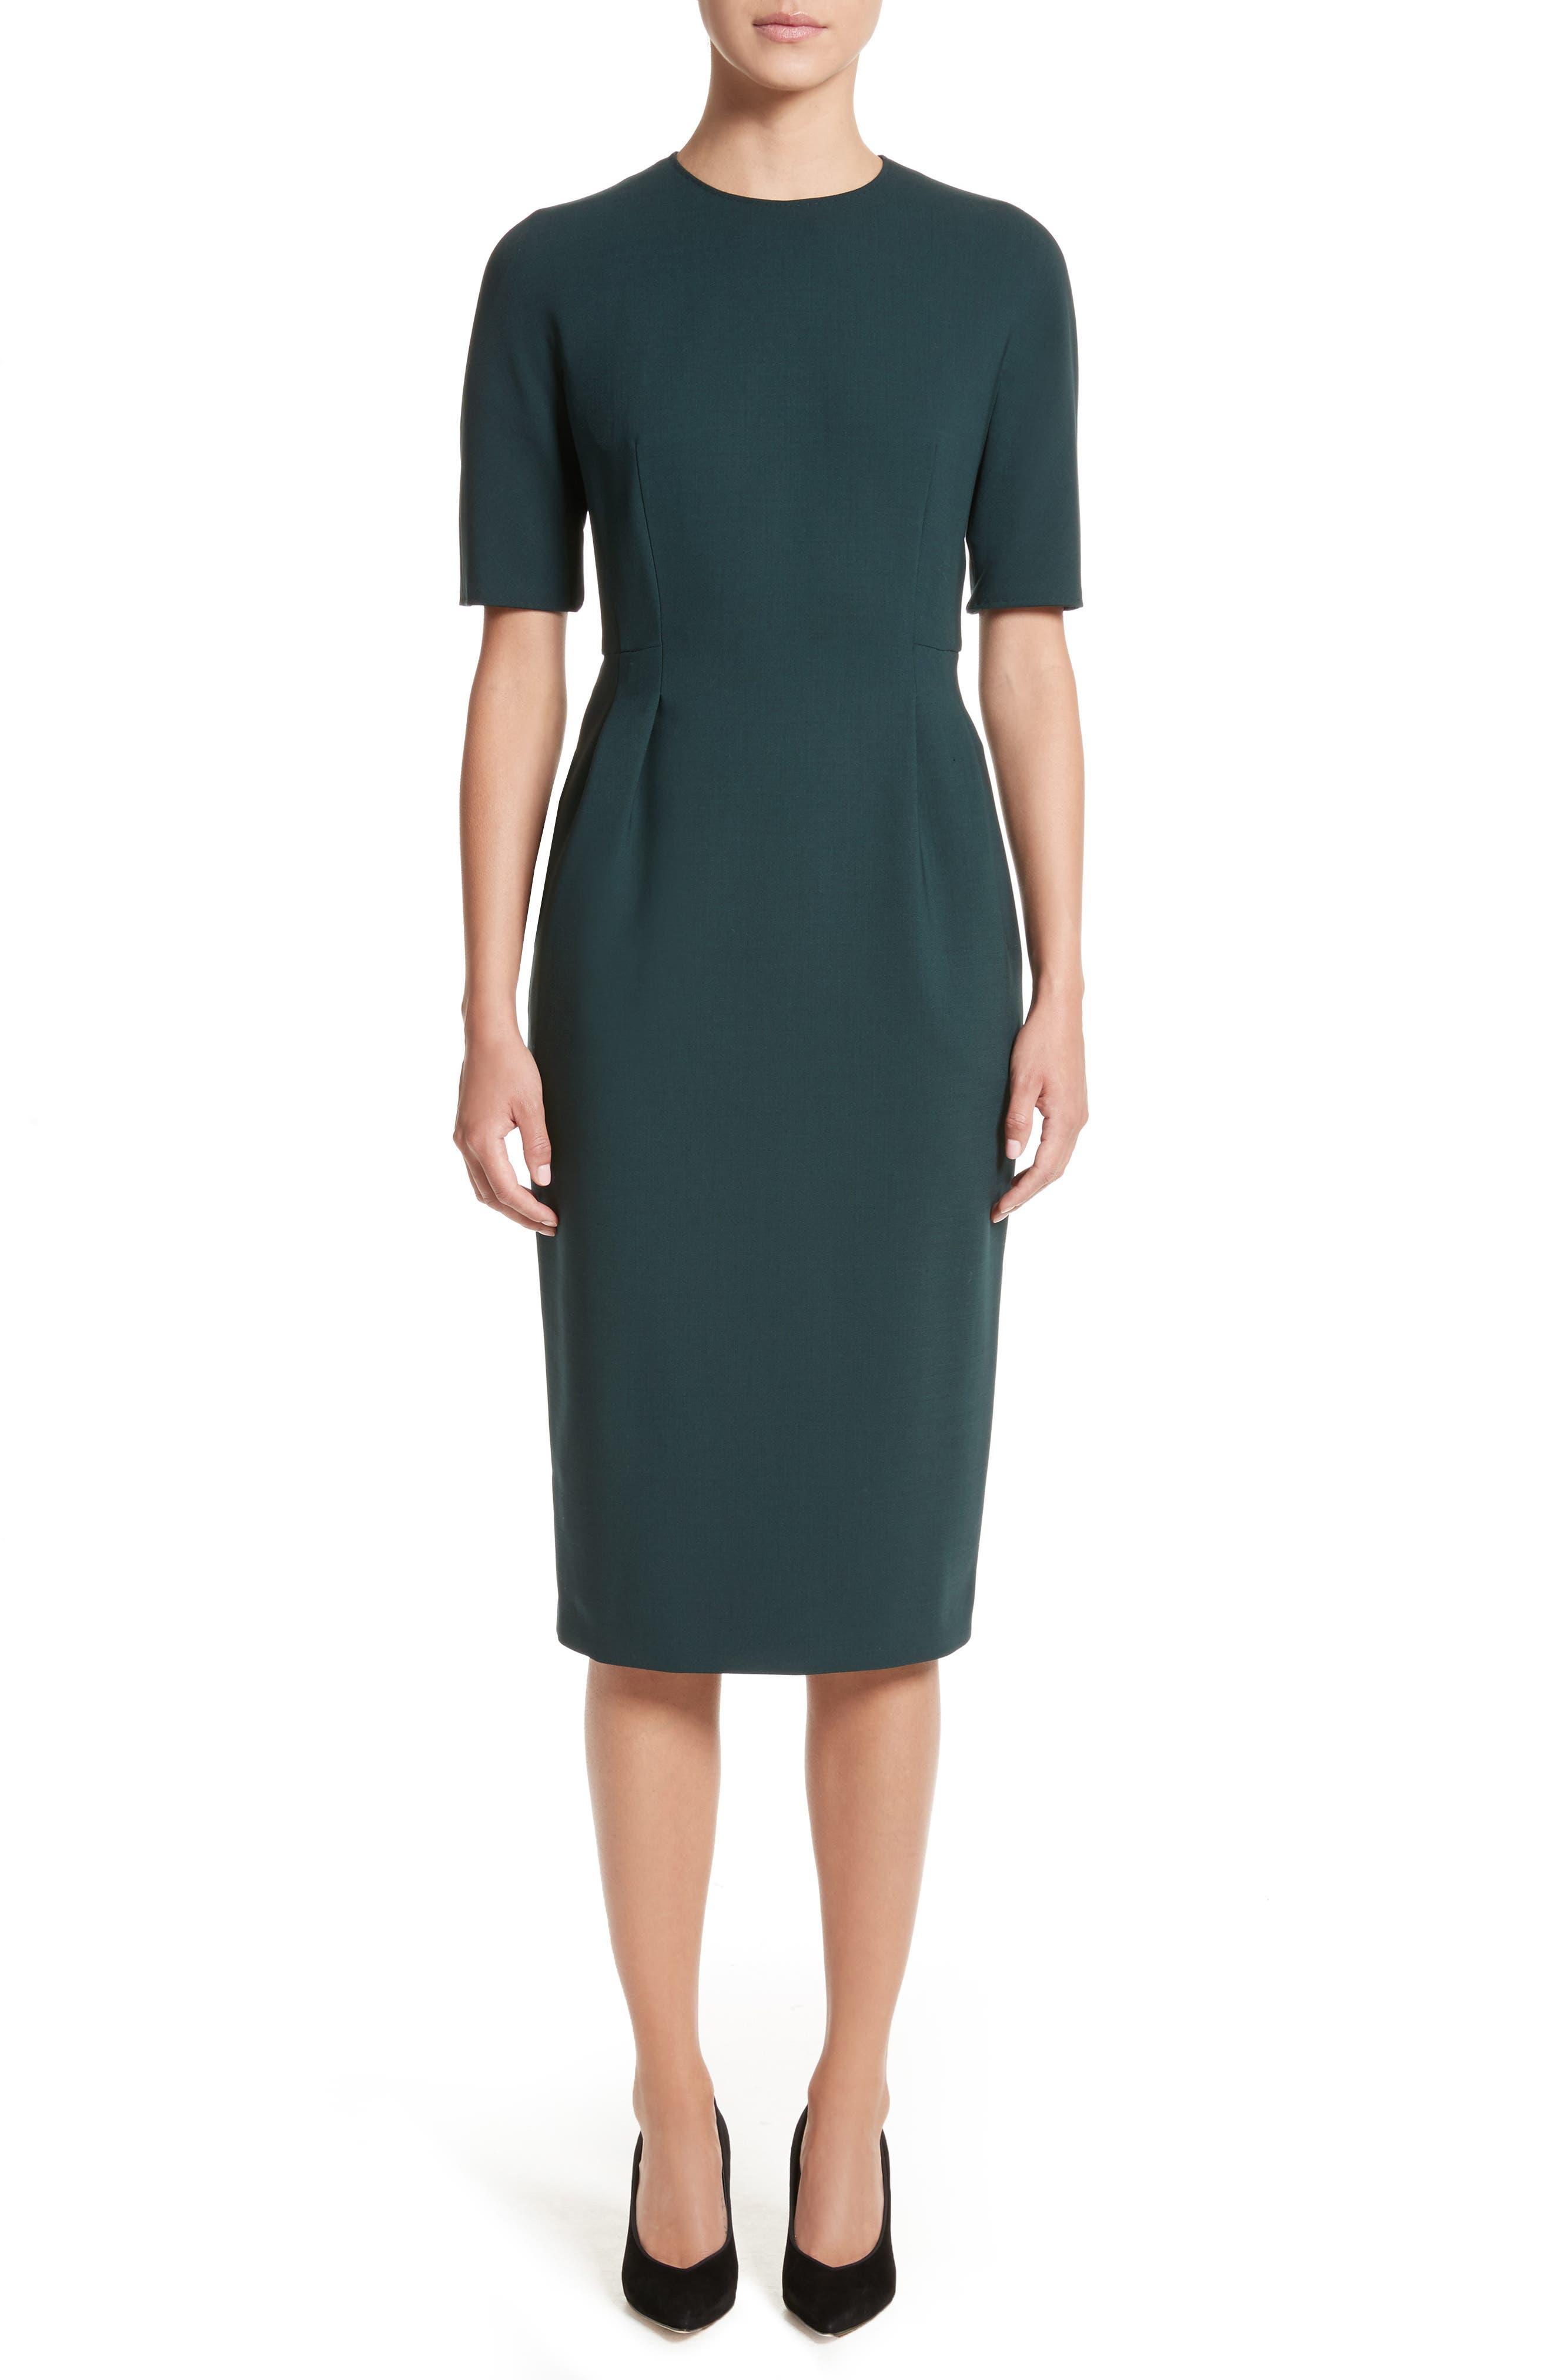 Umano Stretch Wool Sheath Dress,                             Main thumbnail 1, color,                             Dark Green